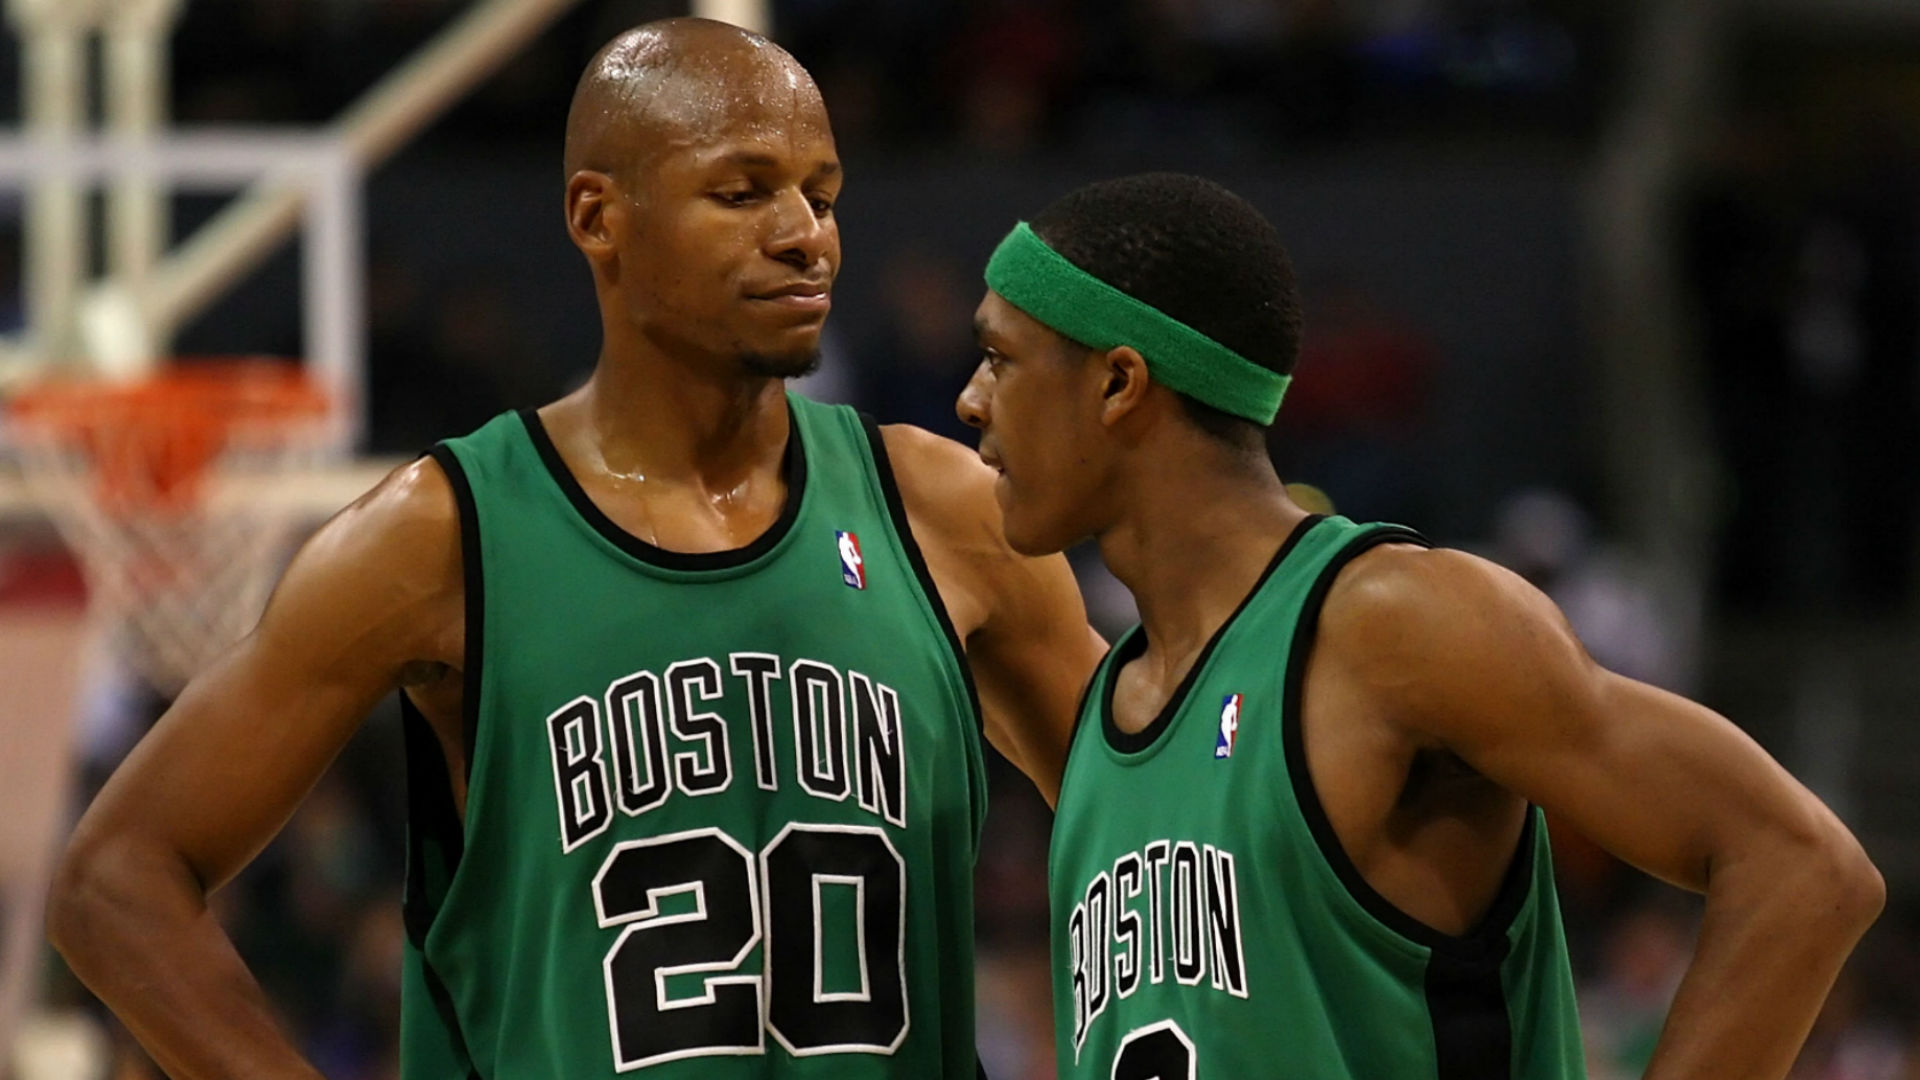 Ray Allen's new book sheds light on Celtics drama, intense